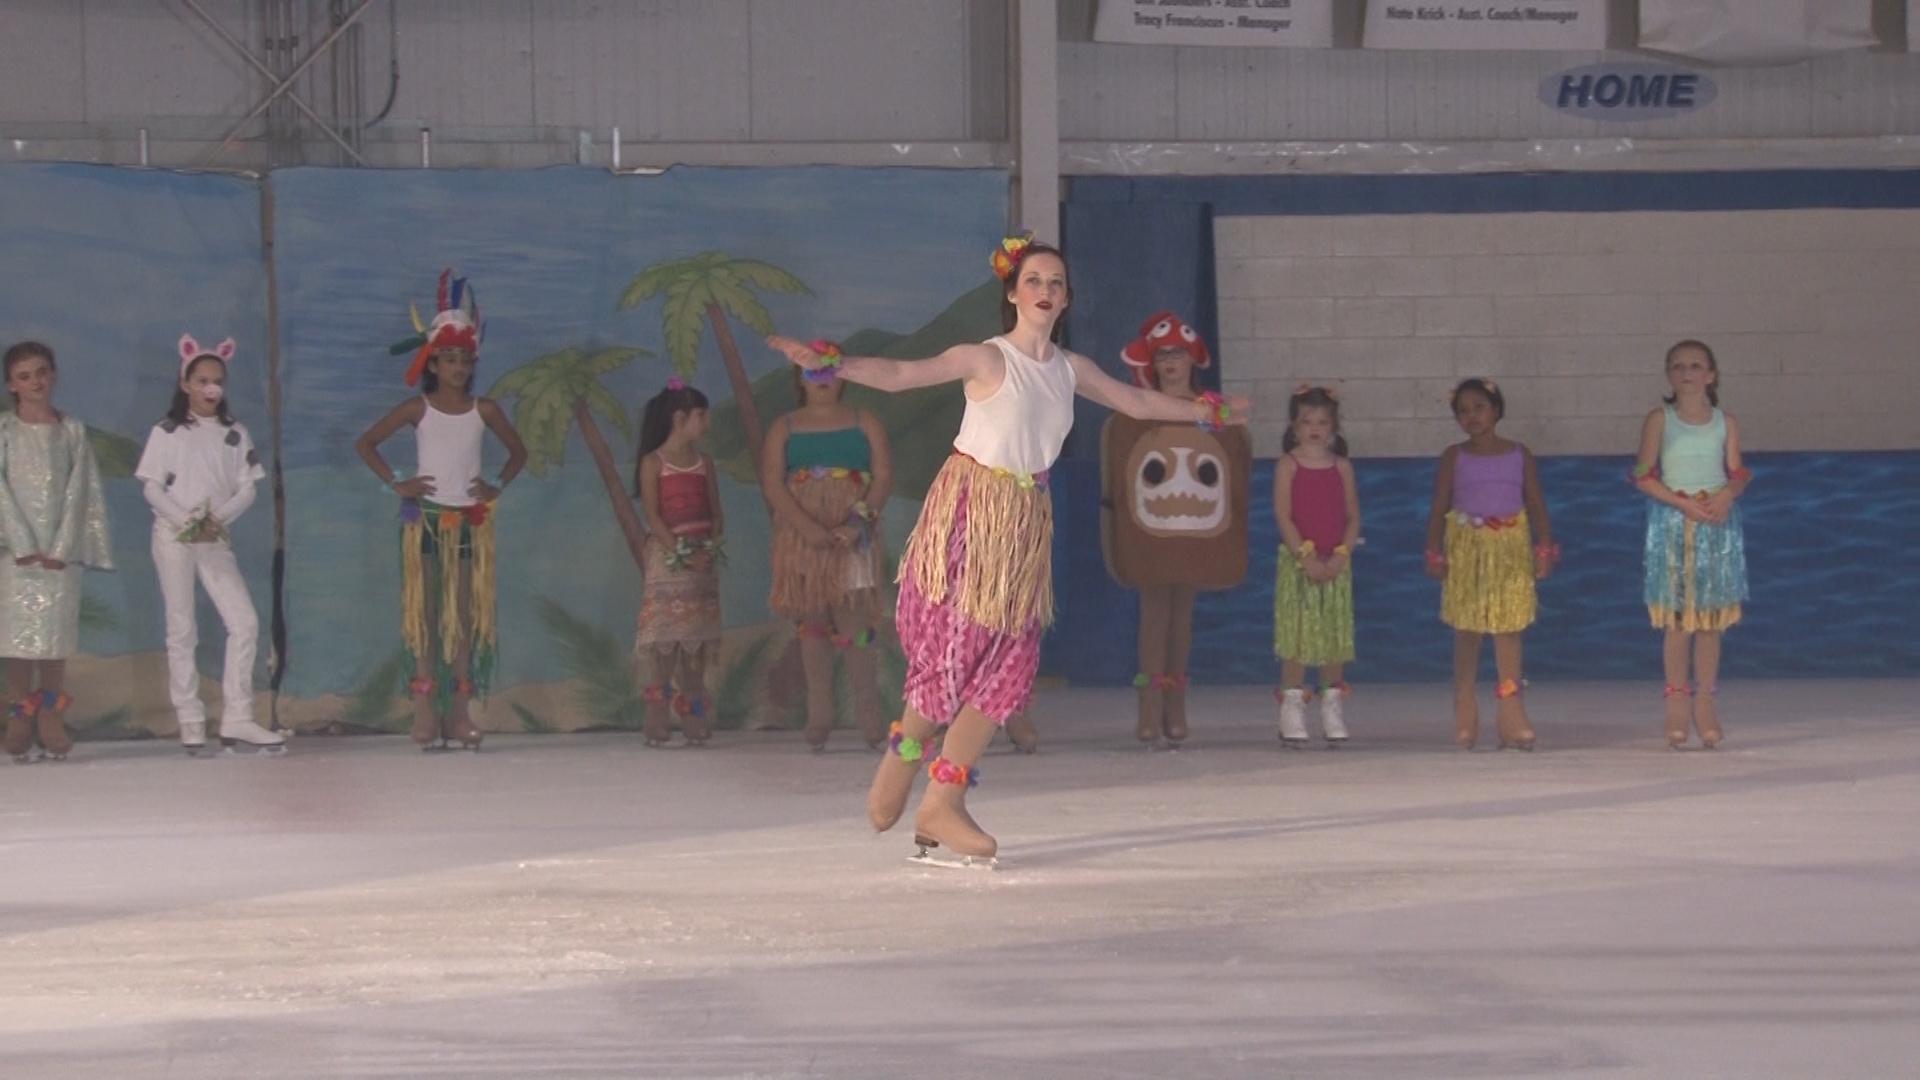 Power Play Maui Skate on Ice 071417.01_00_26_10.Still100.jpg